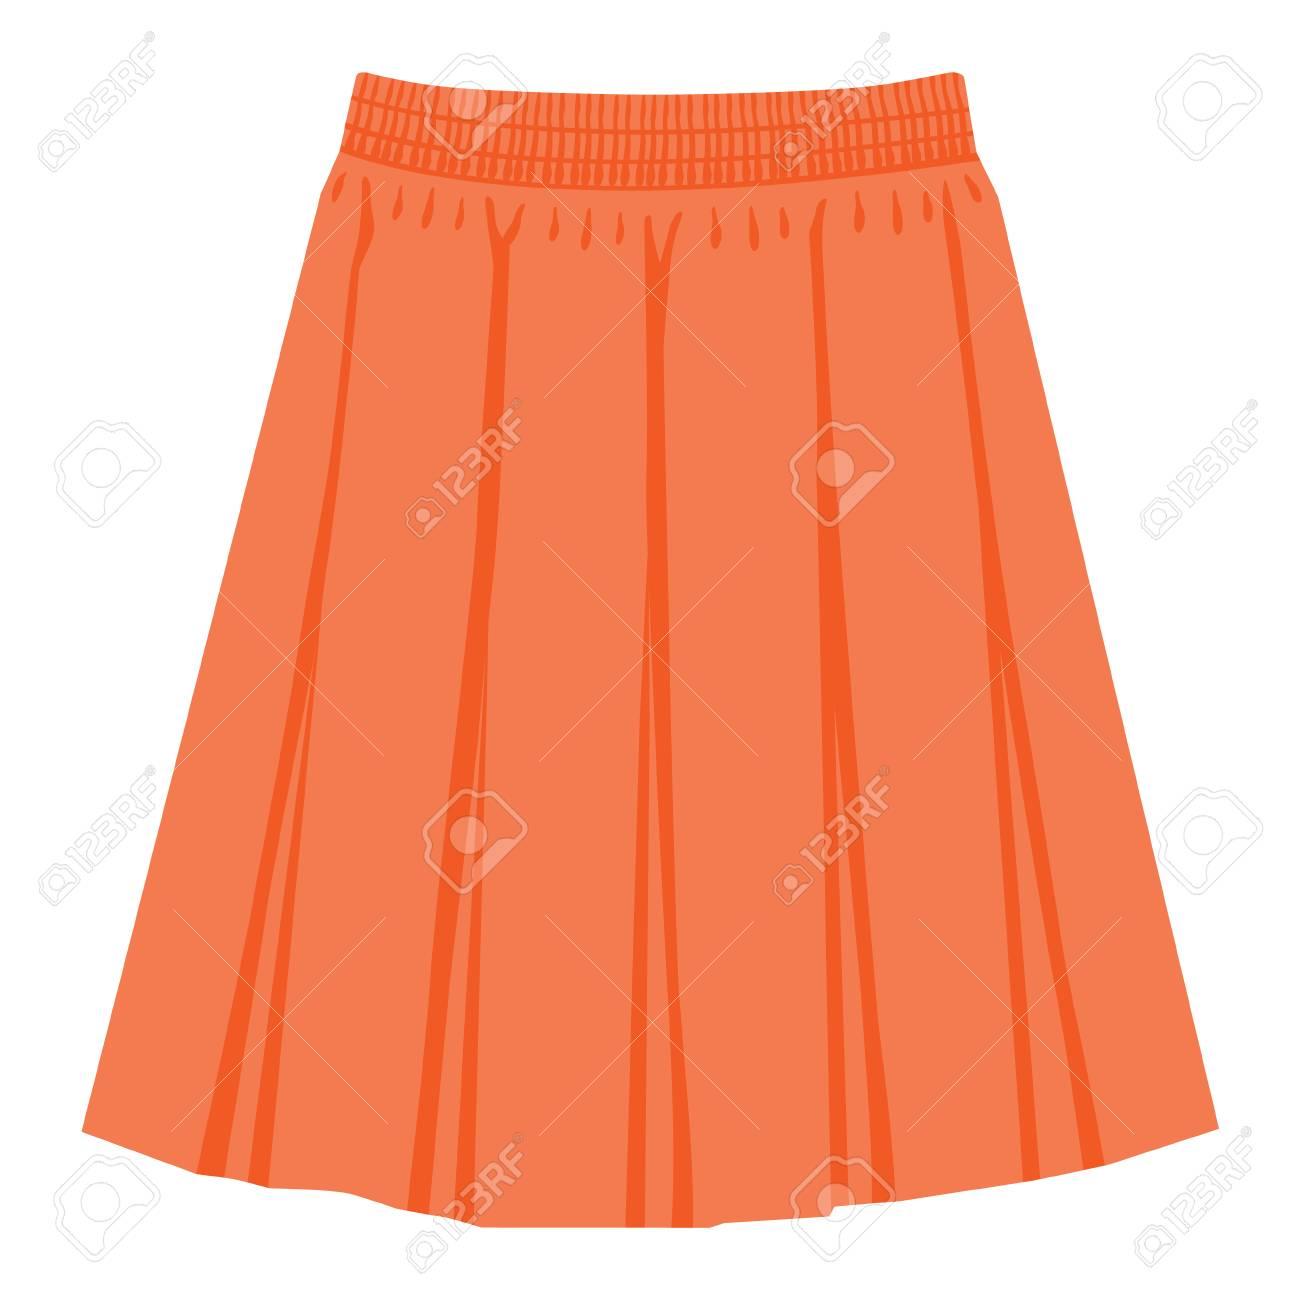 Vector orange skirt template, design fashion woman illustration. Women box pleated skirt - 116070617